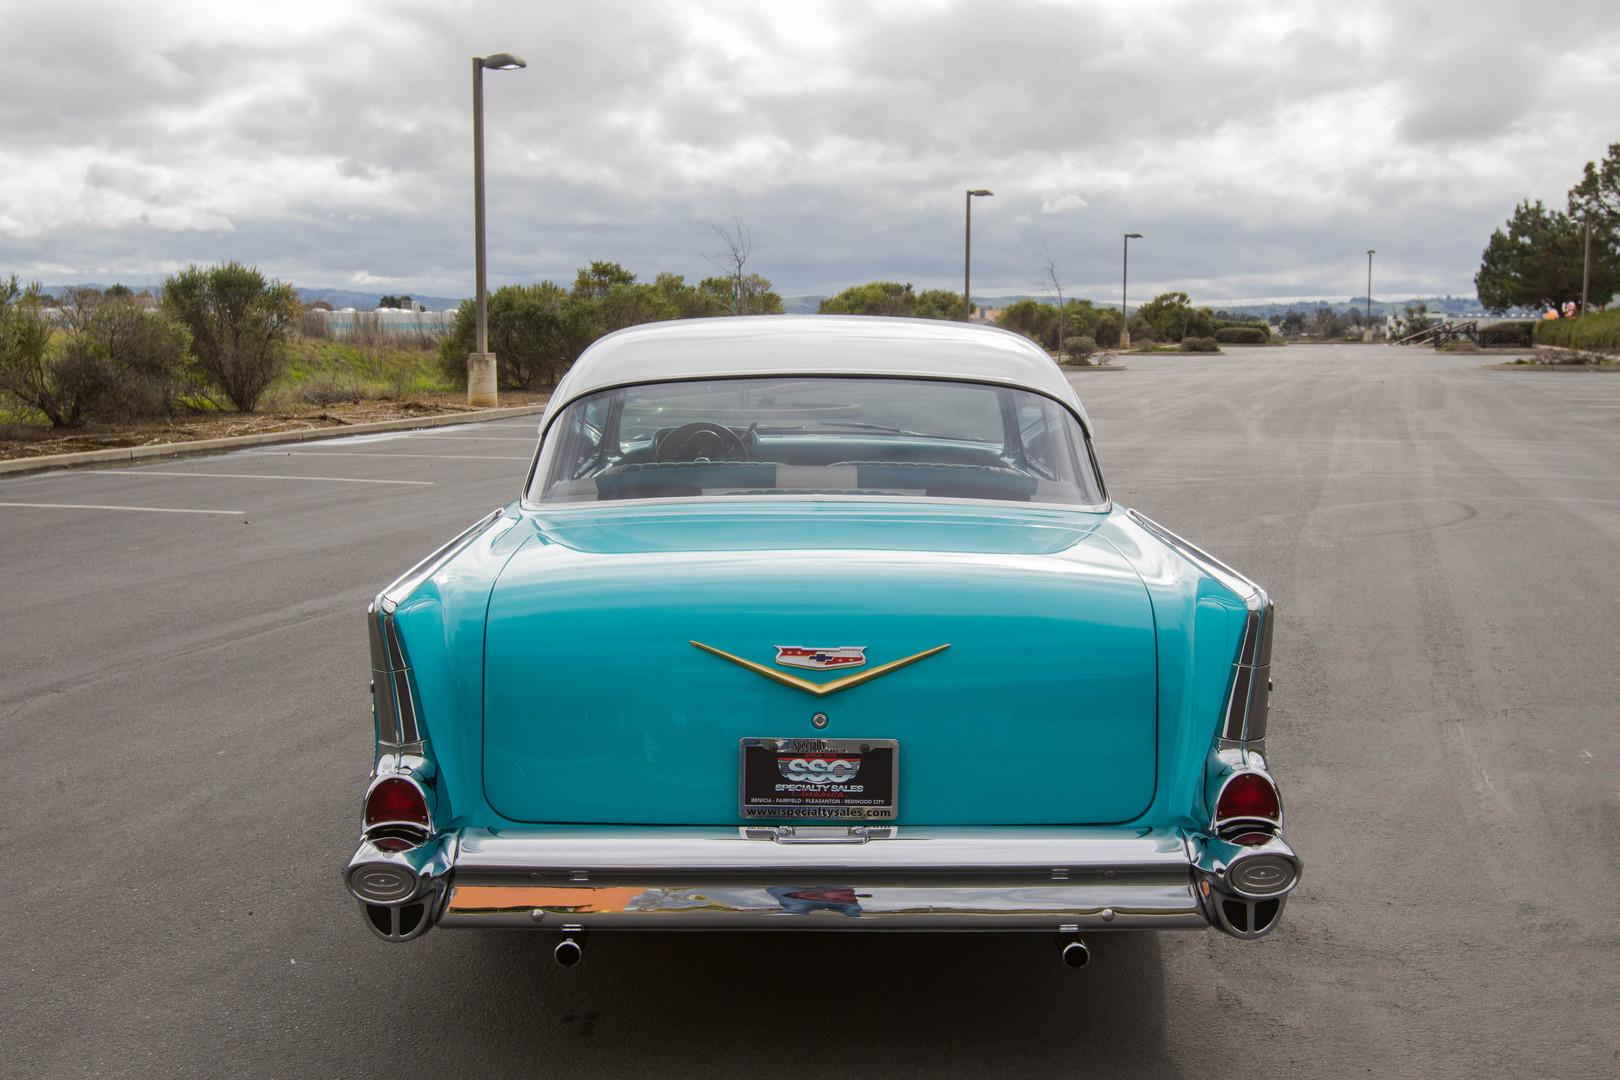 Chevrolet vehicles specialty sales classics for 1957 chevy bel air 4 door hardtop for sale